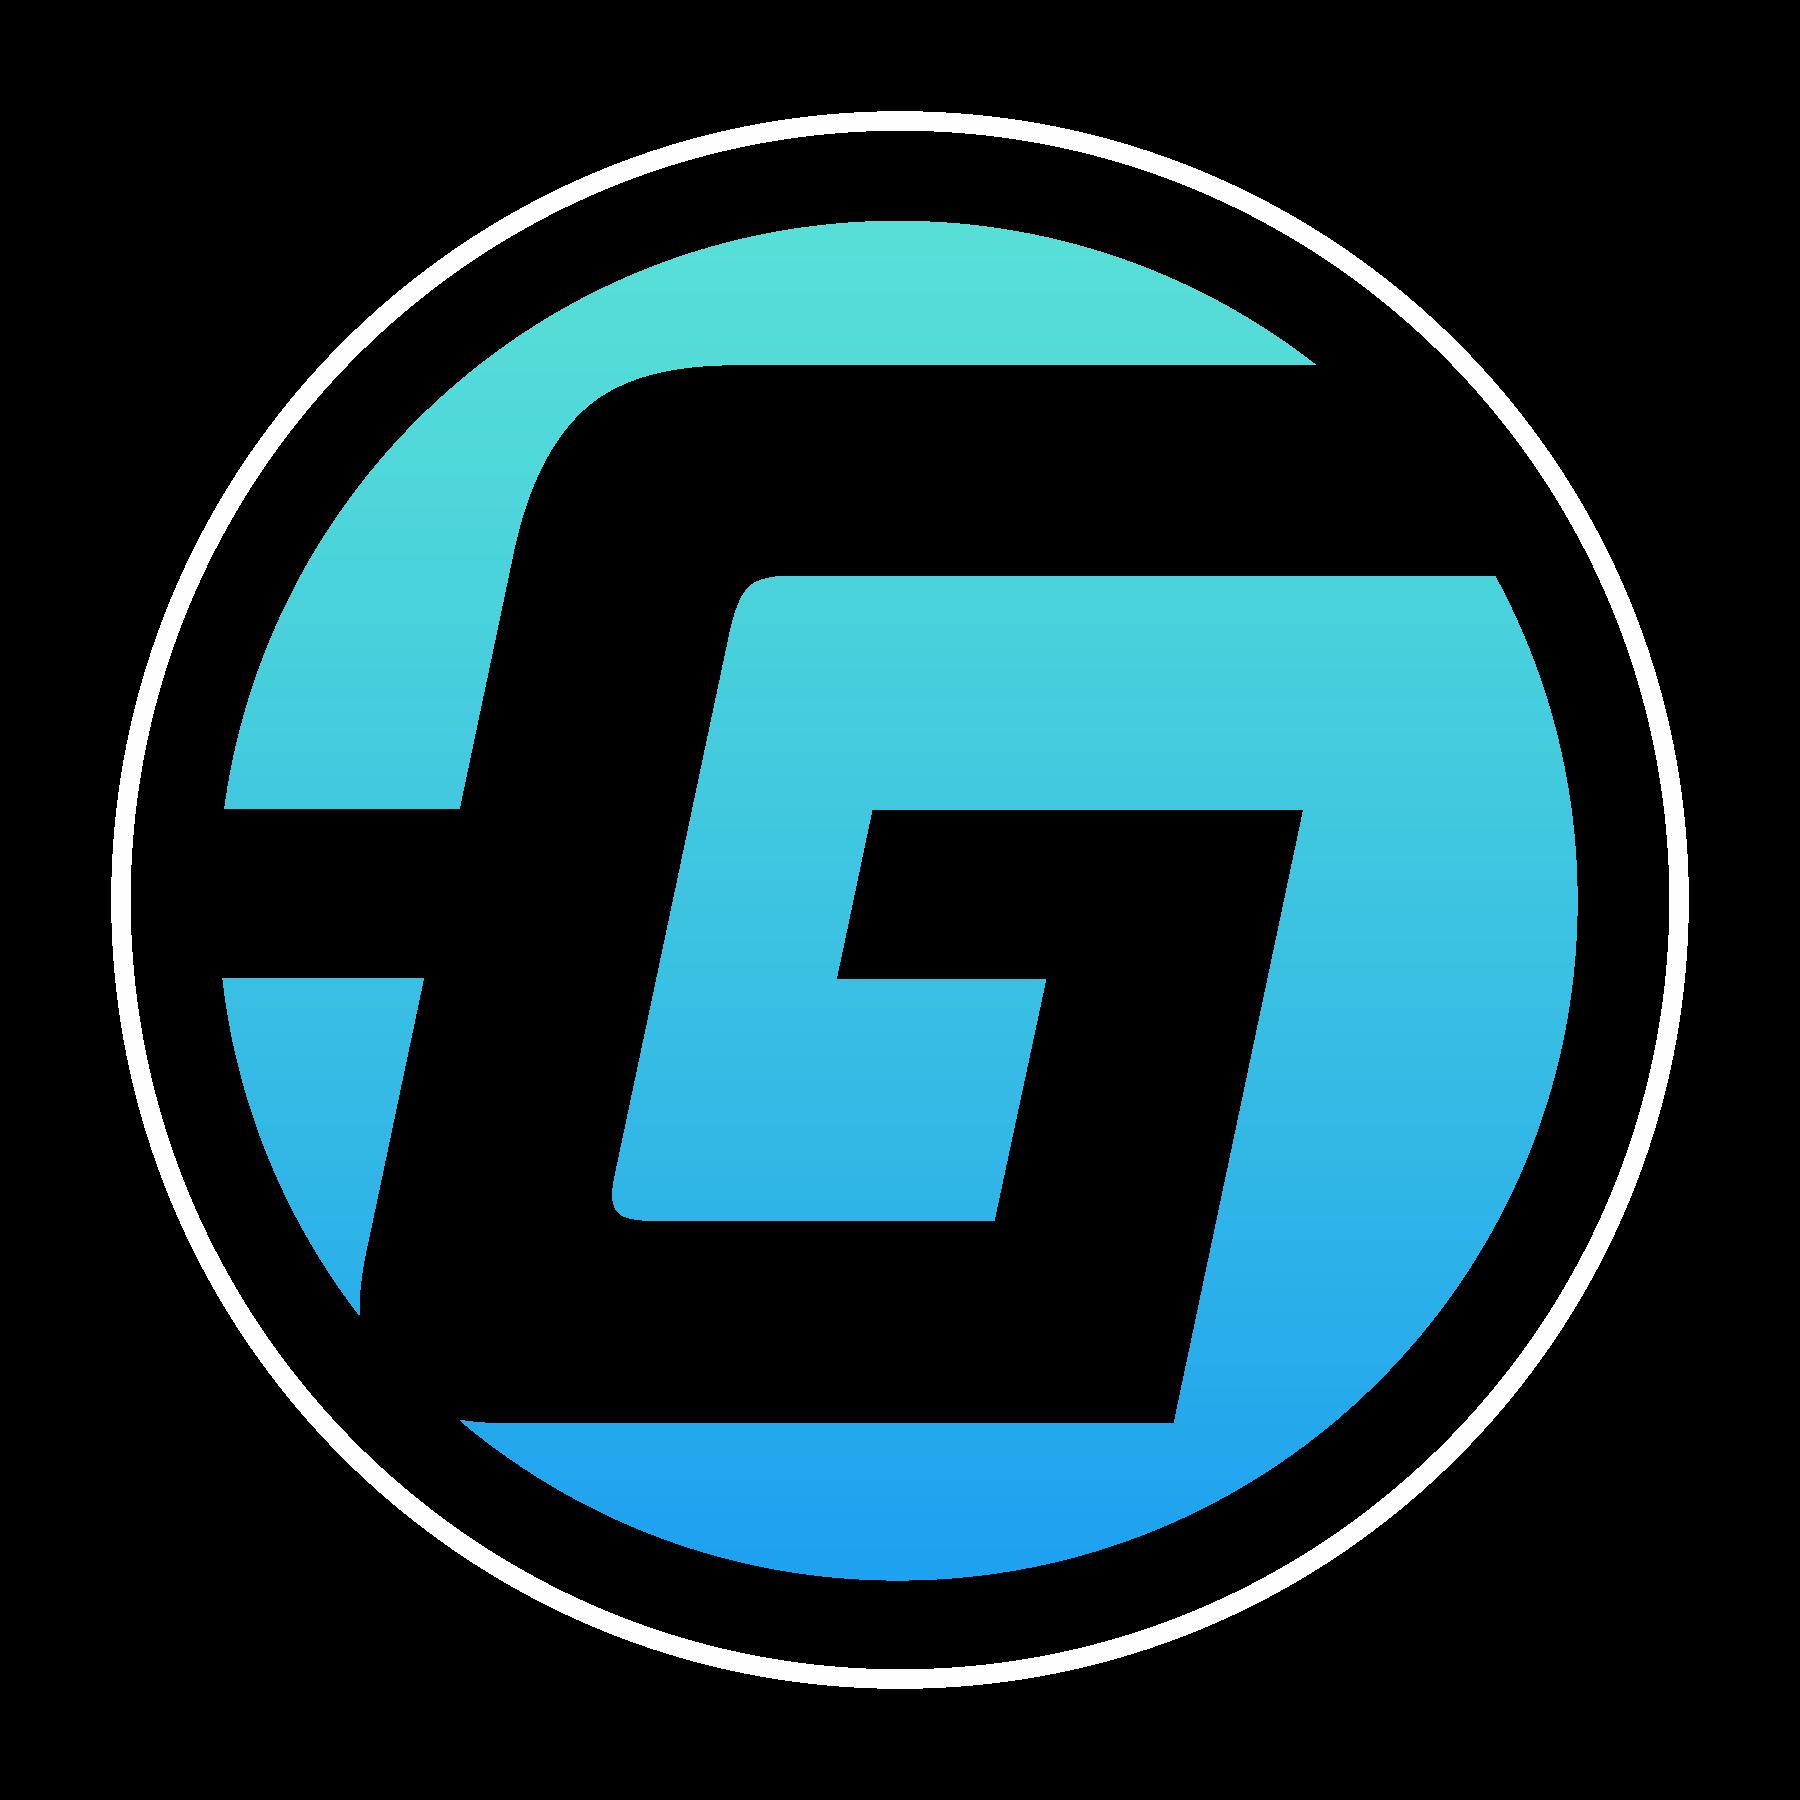 Genesis (GENX)